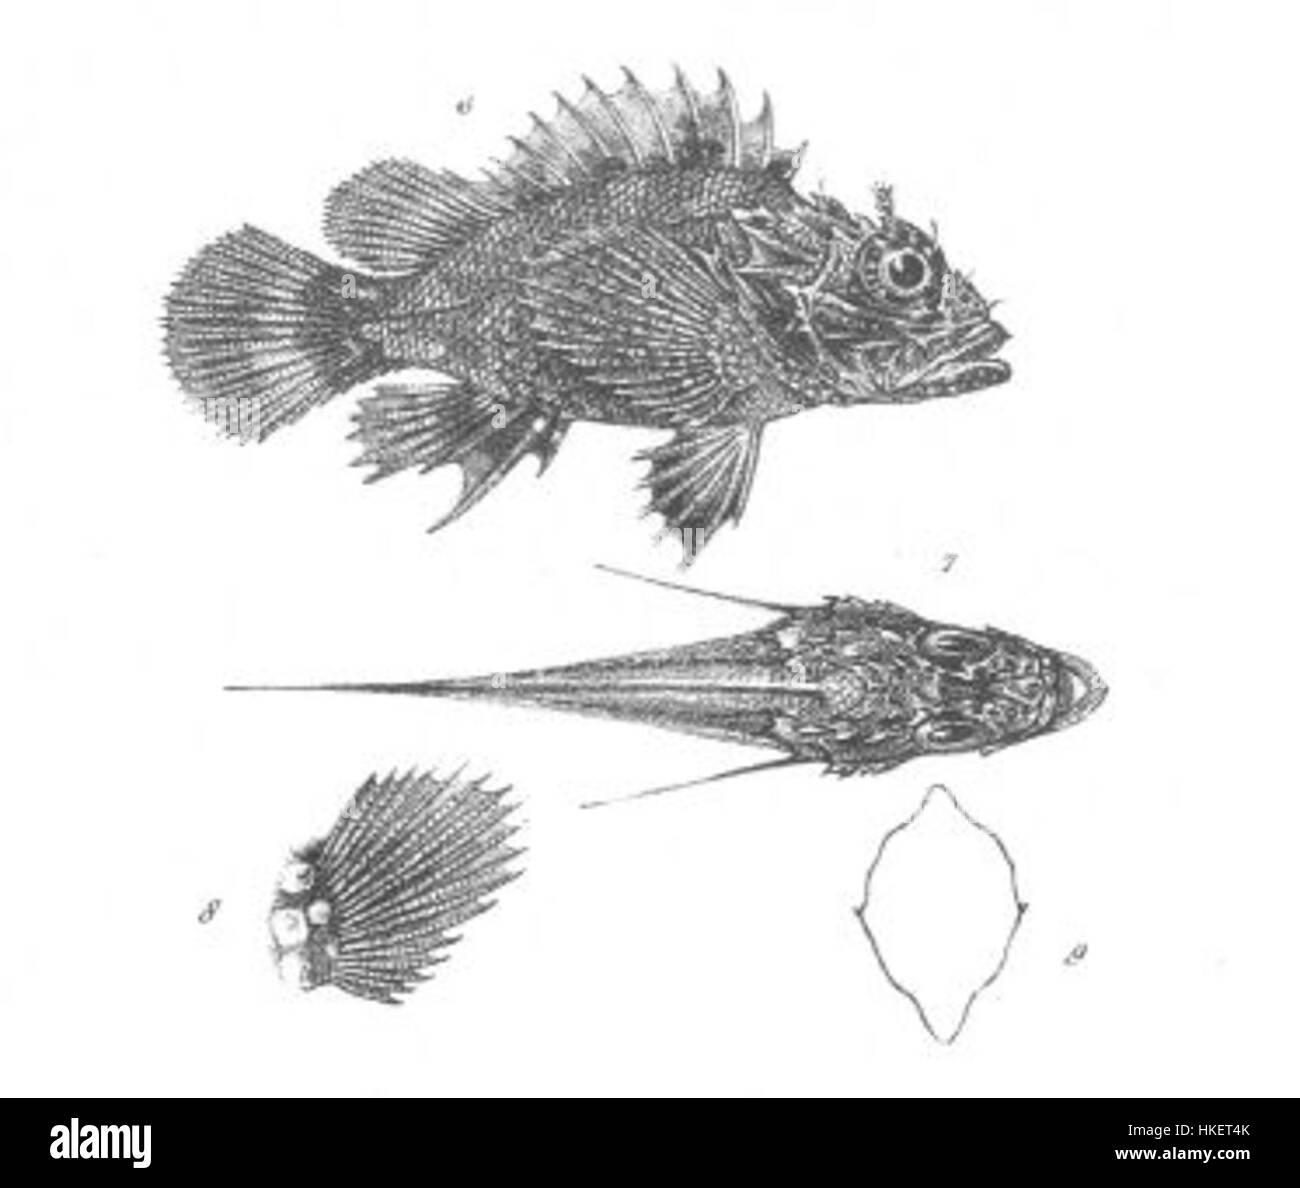 Scorpaena Stokesii (Discoveries in Australia) - Stock Image